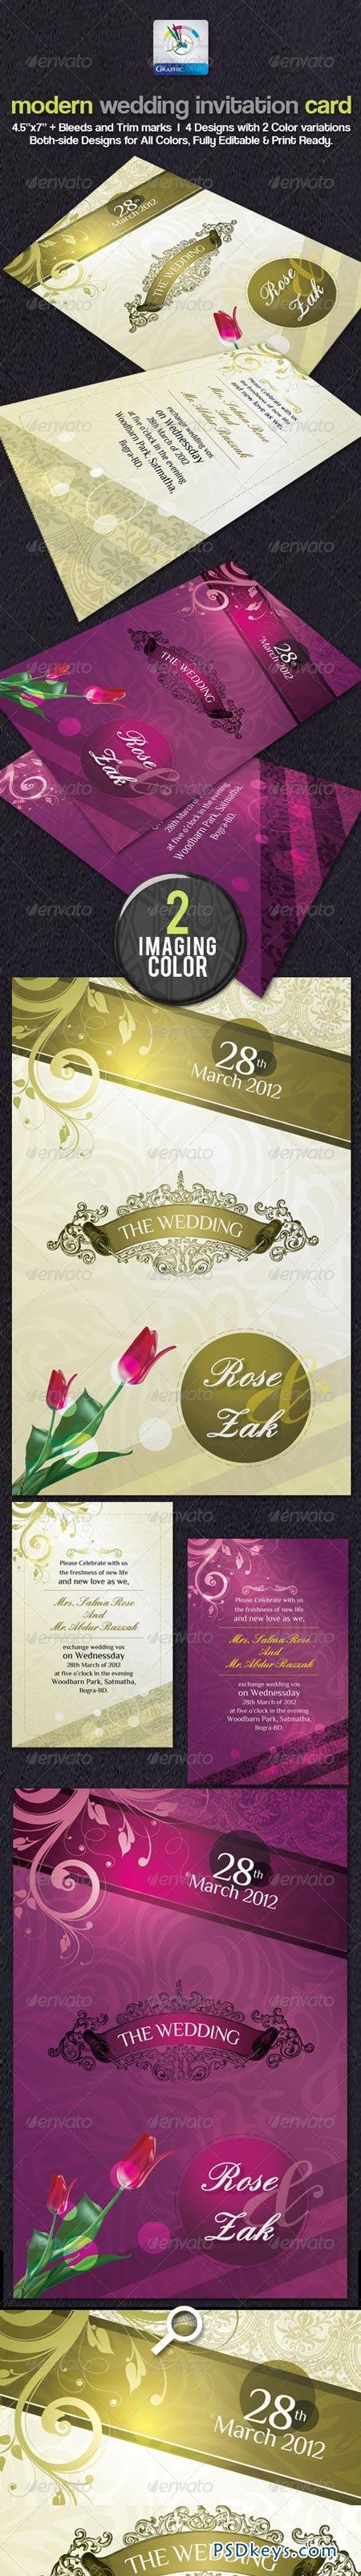 Modern Wedding Invitation Cards 2393750 » Free Download Photoshop ...